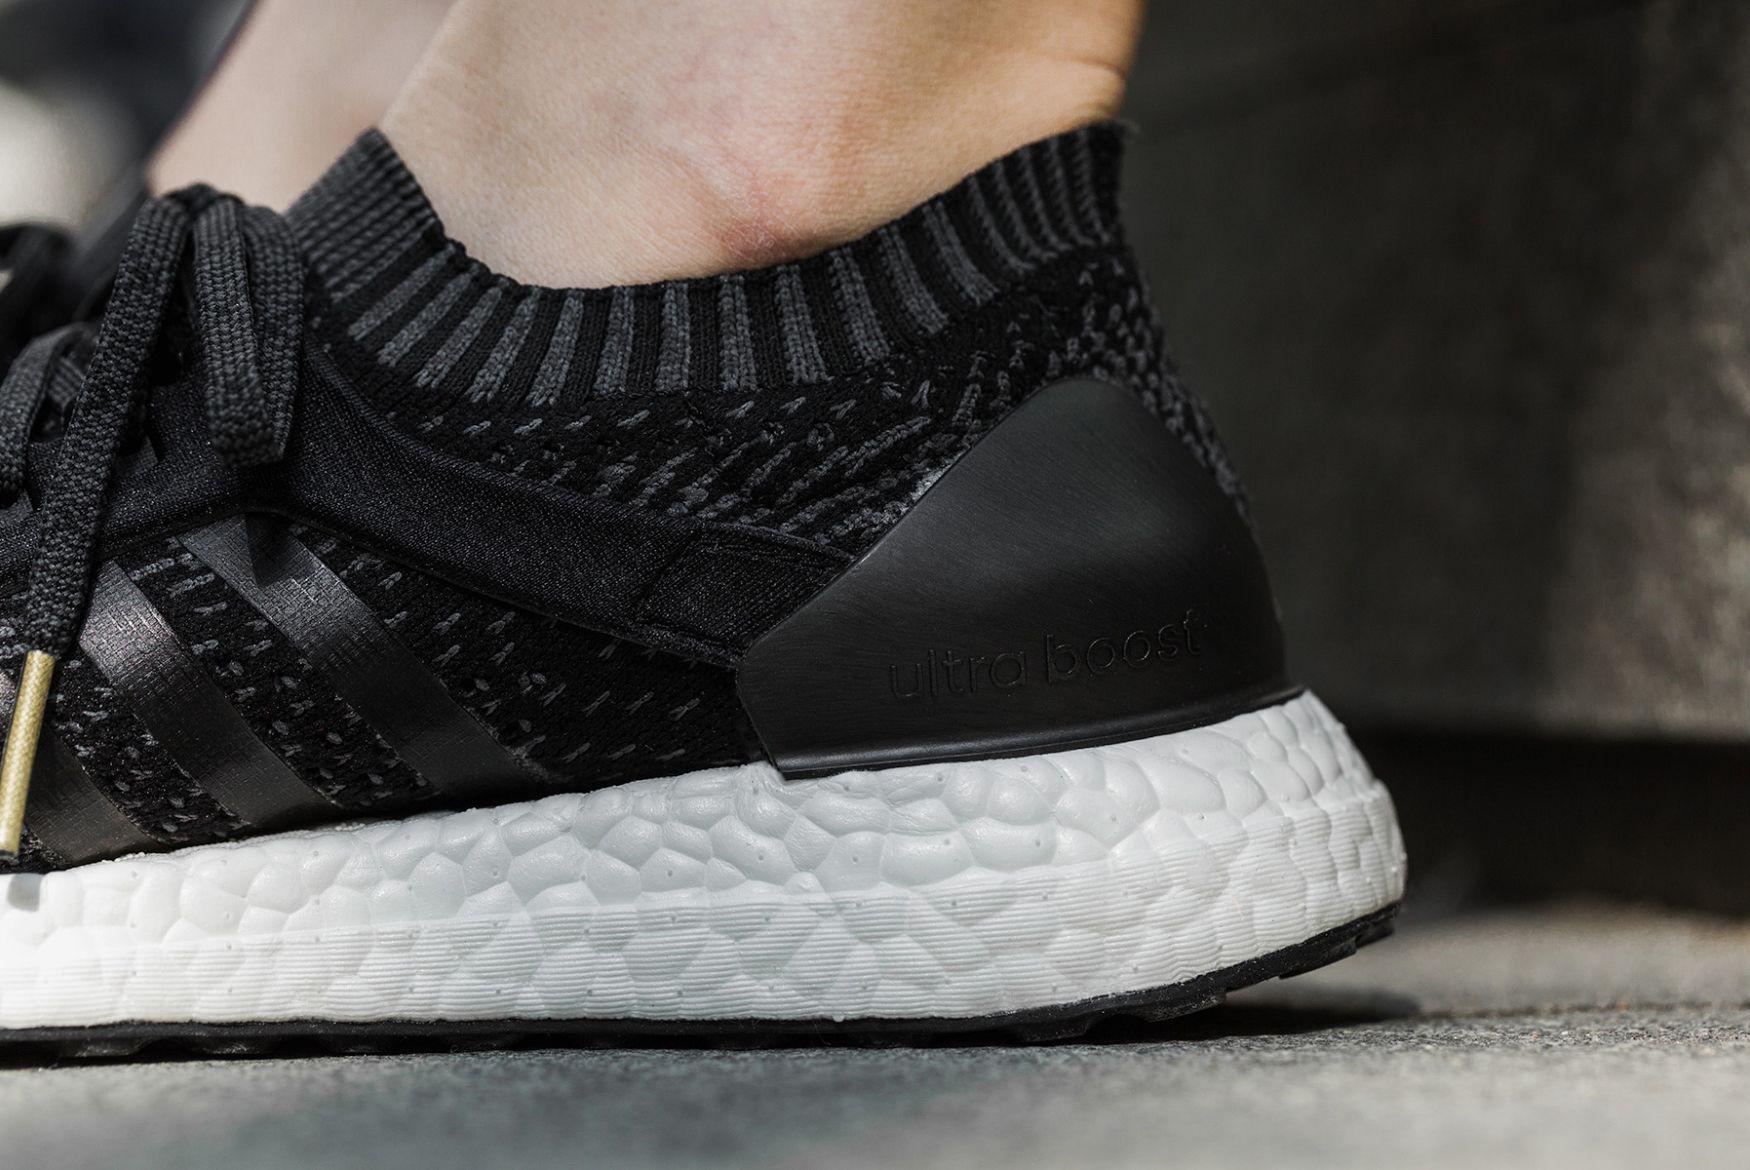 Adidas Ultraboost X Closer Look 10